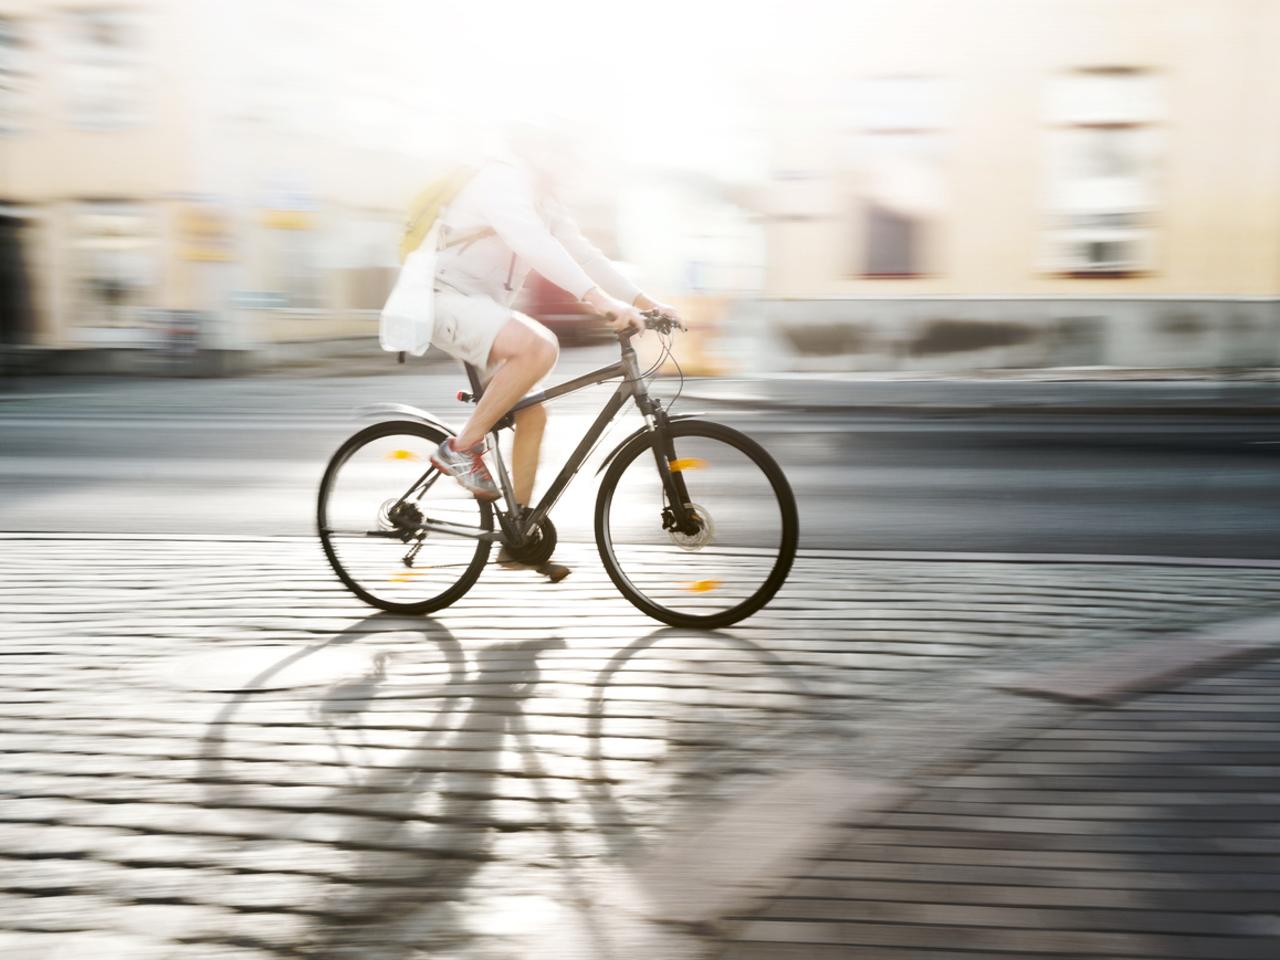 imec City of Things - slimmer fietsen in Antwerpen